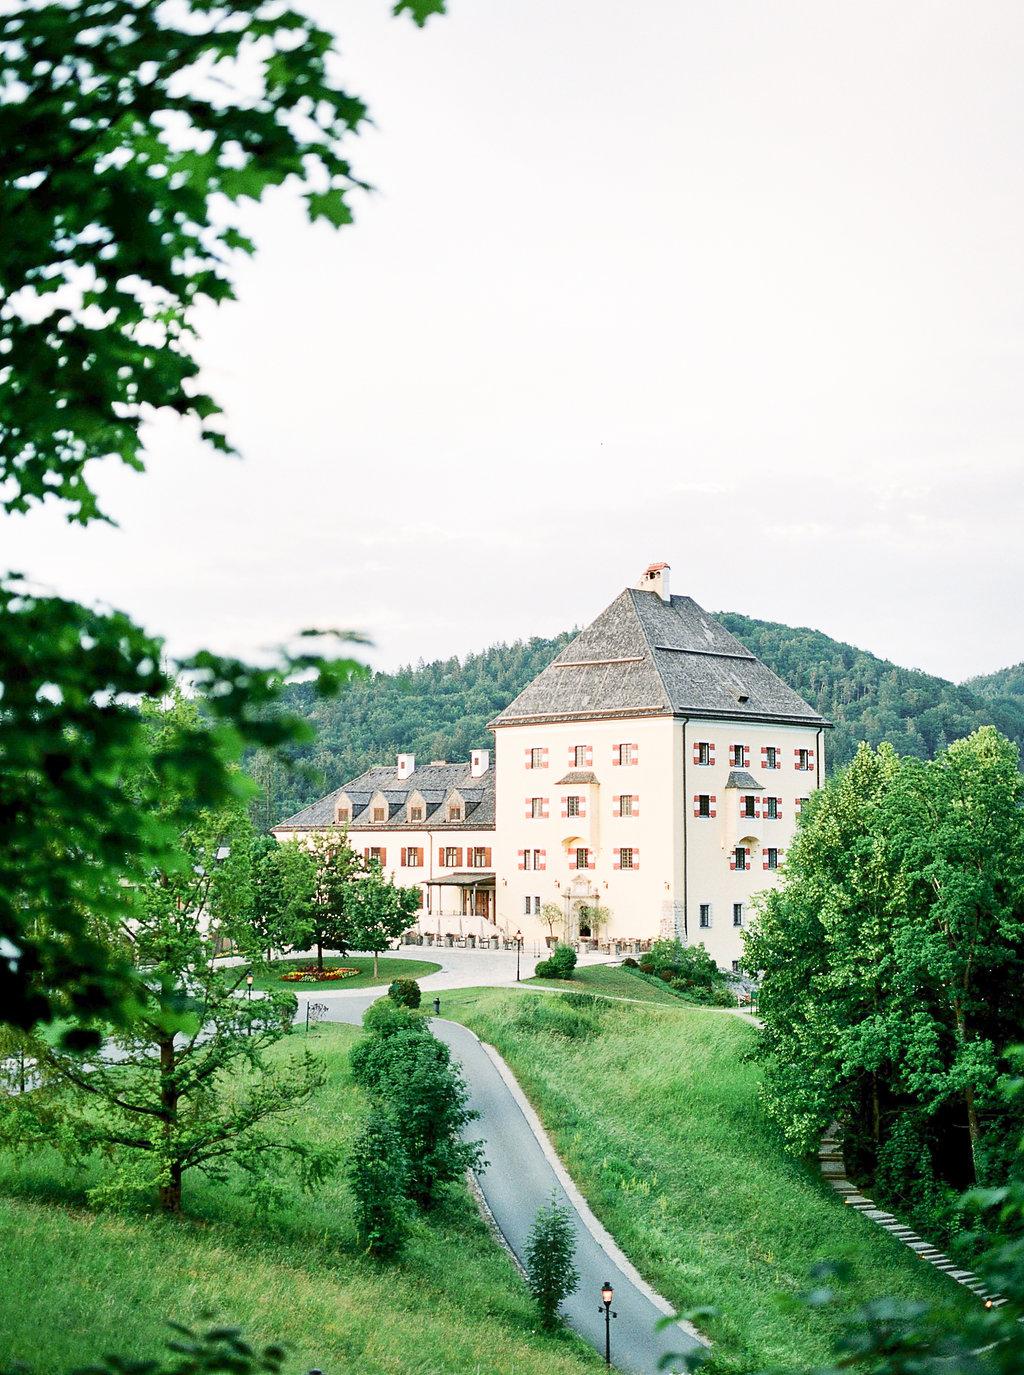 Luxe Navy and Pink Wedding at Schloss Fuschl in Austria by Tanja Kibogo3.JPG